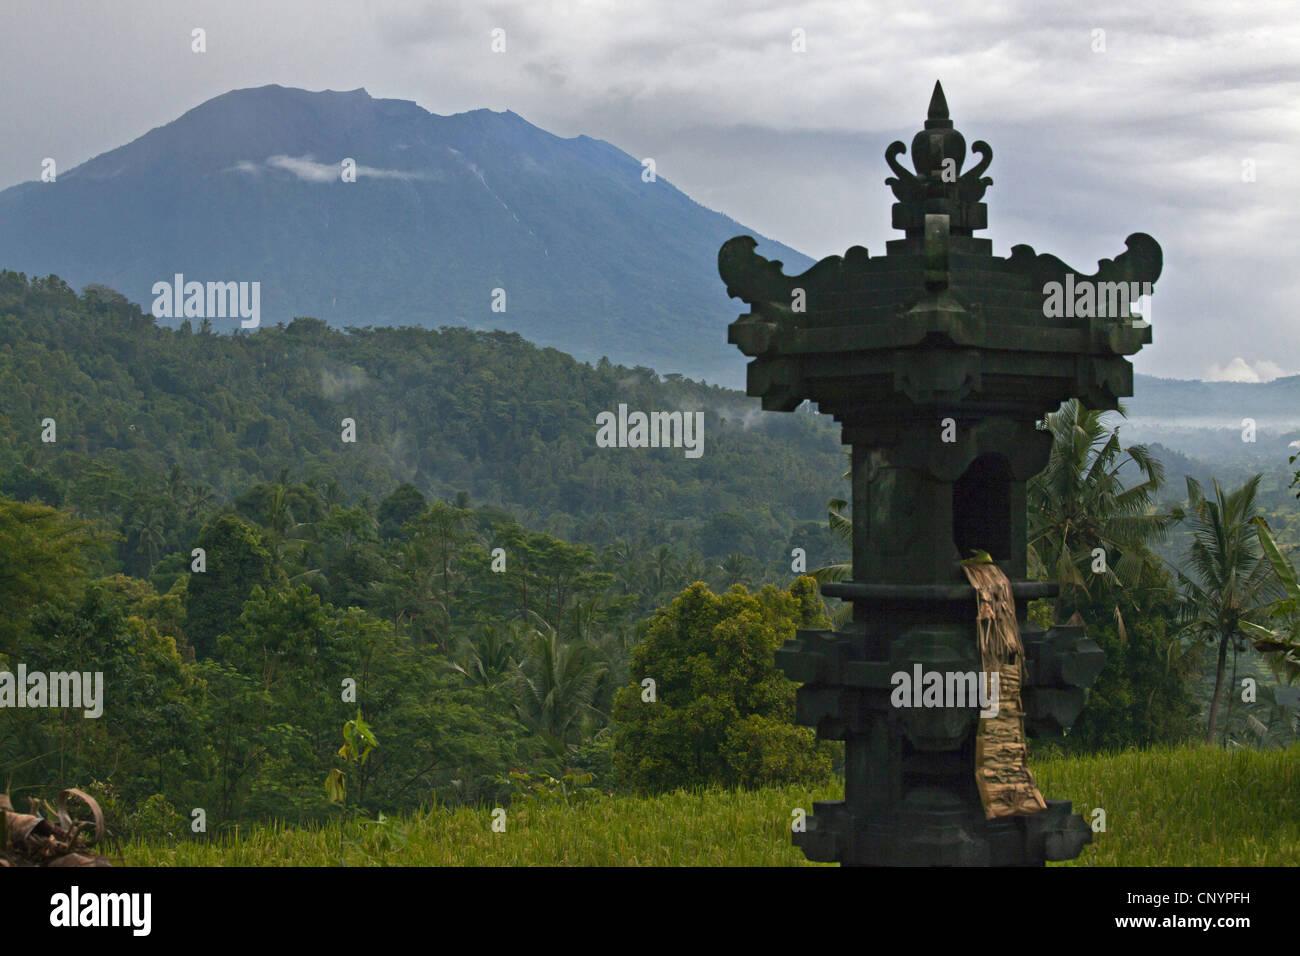 Hindu shrine and Gunung Agung volcano, Indonesia, Bali - Stock Image